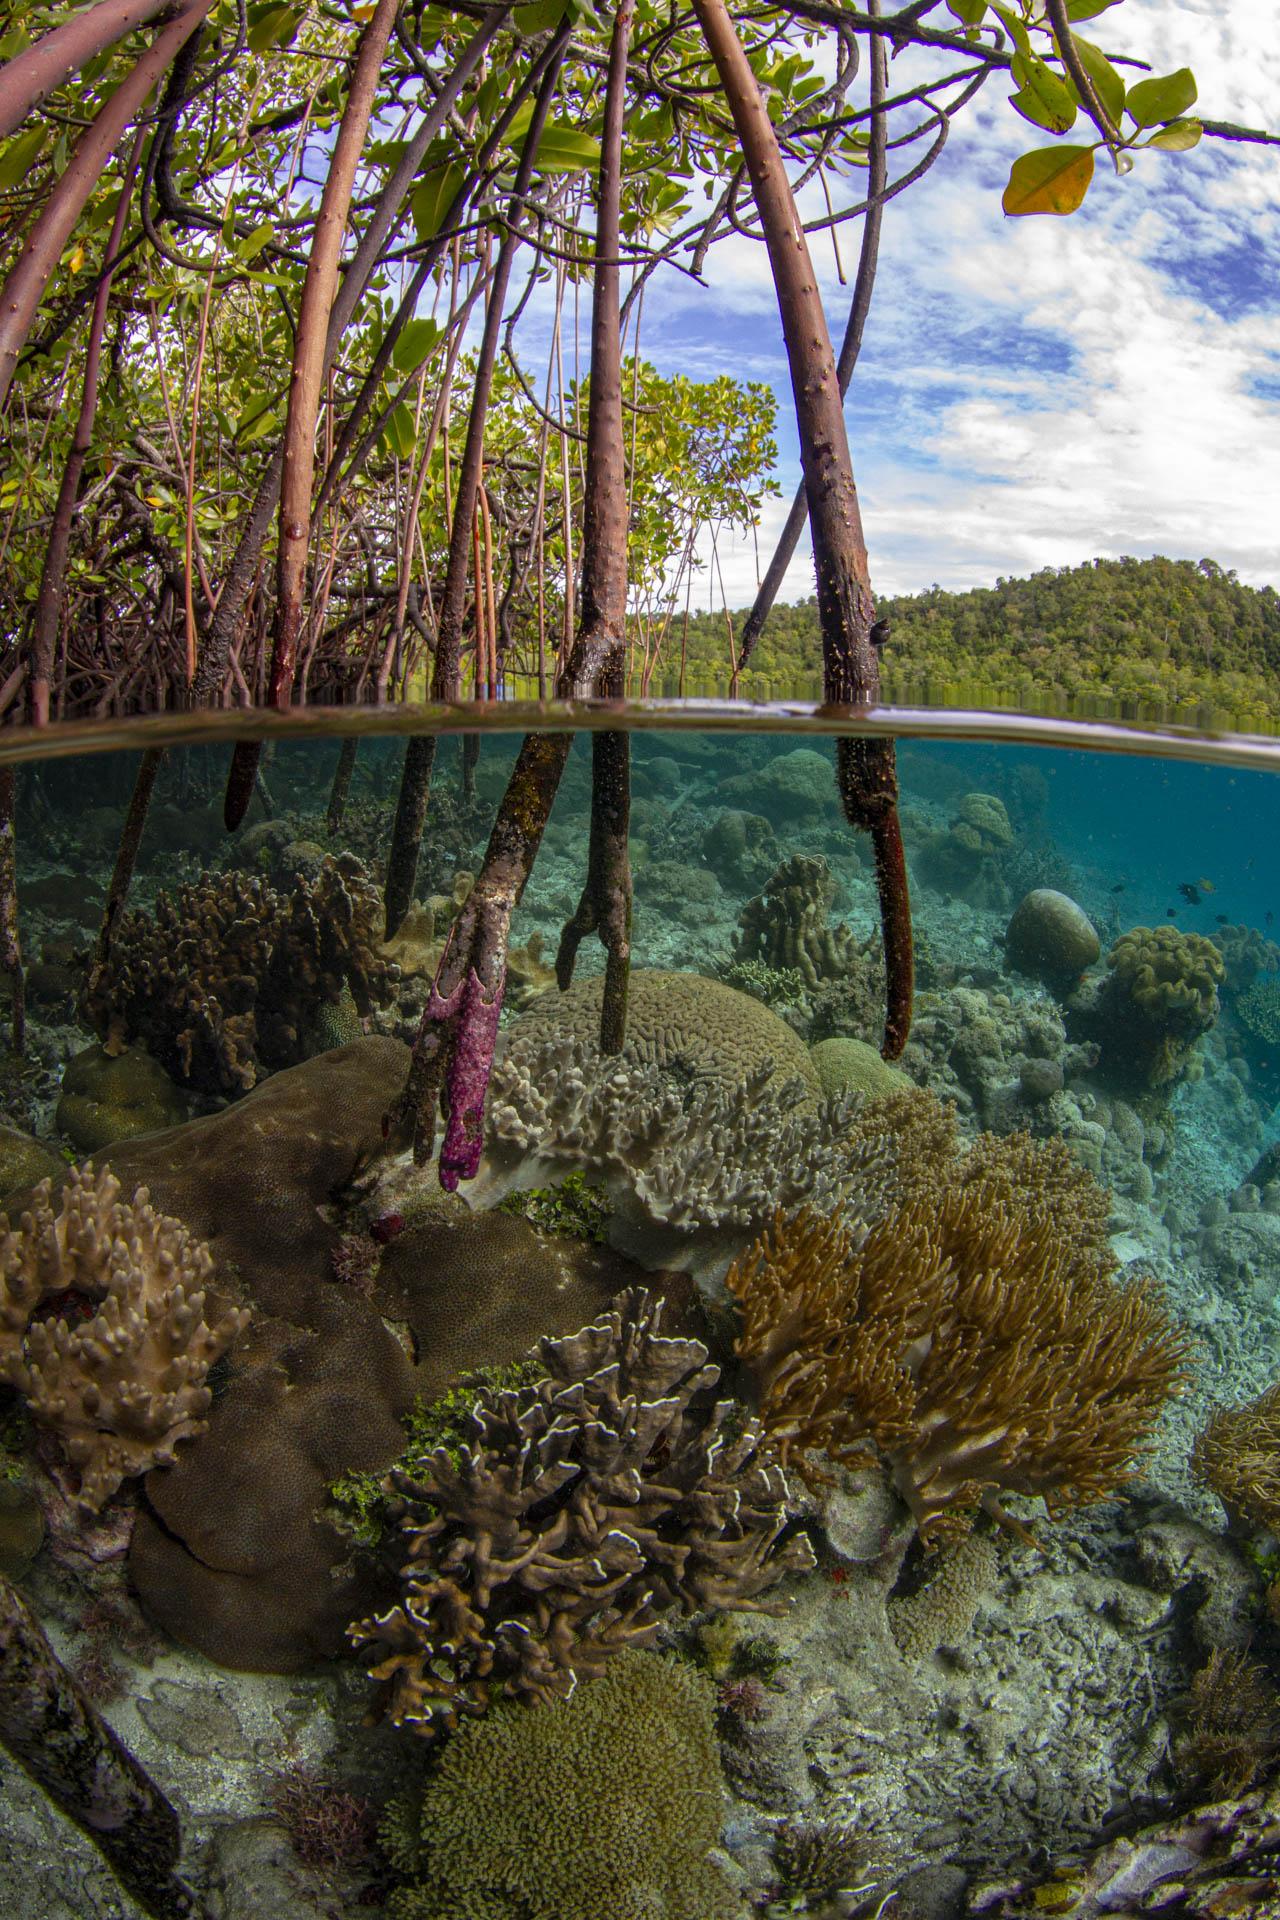 Mangrove scene with coral reef below